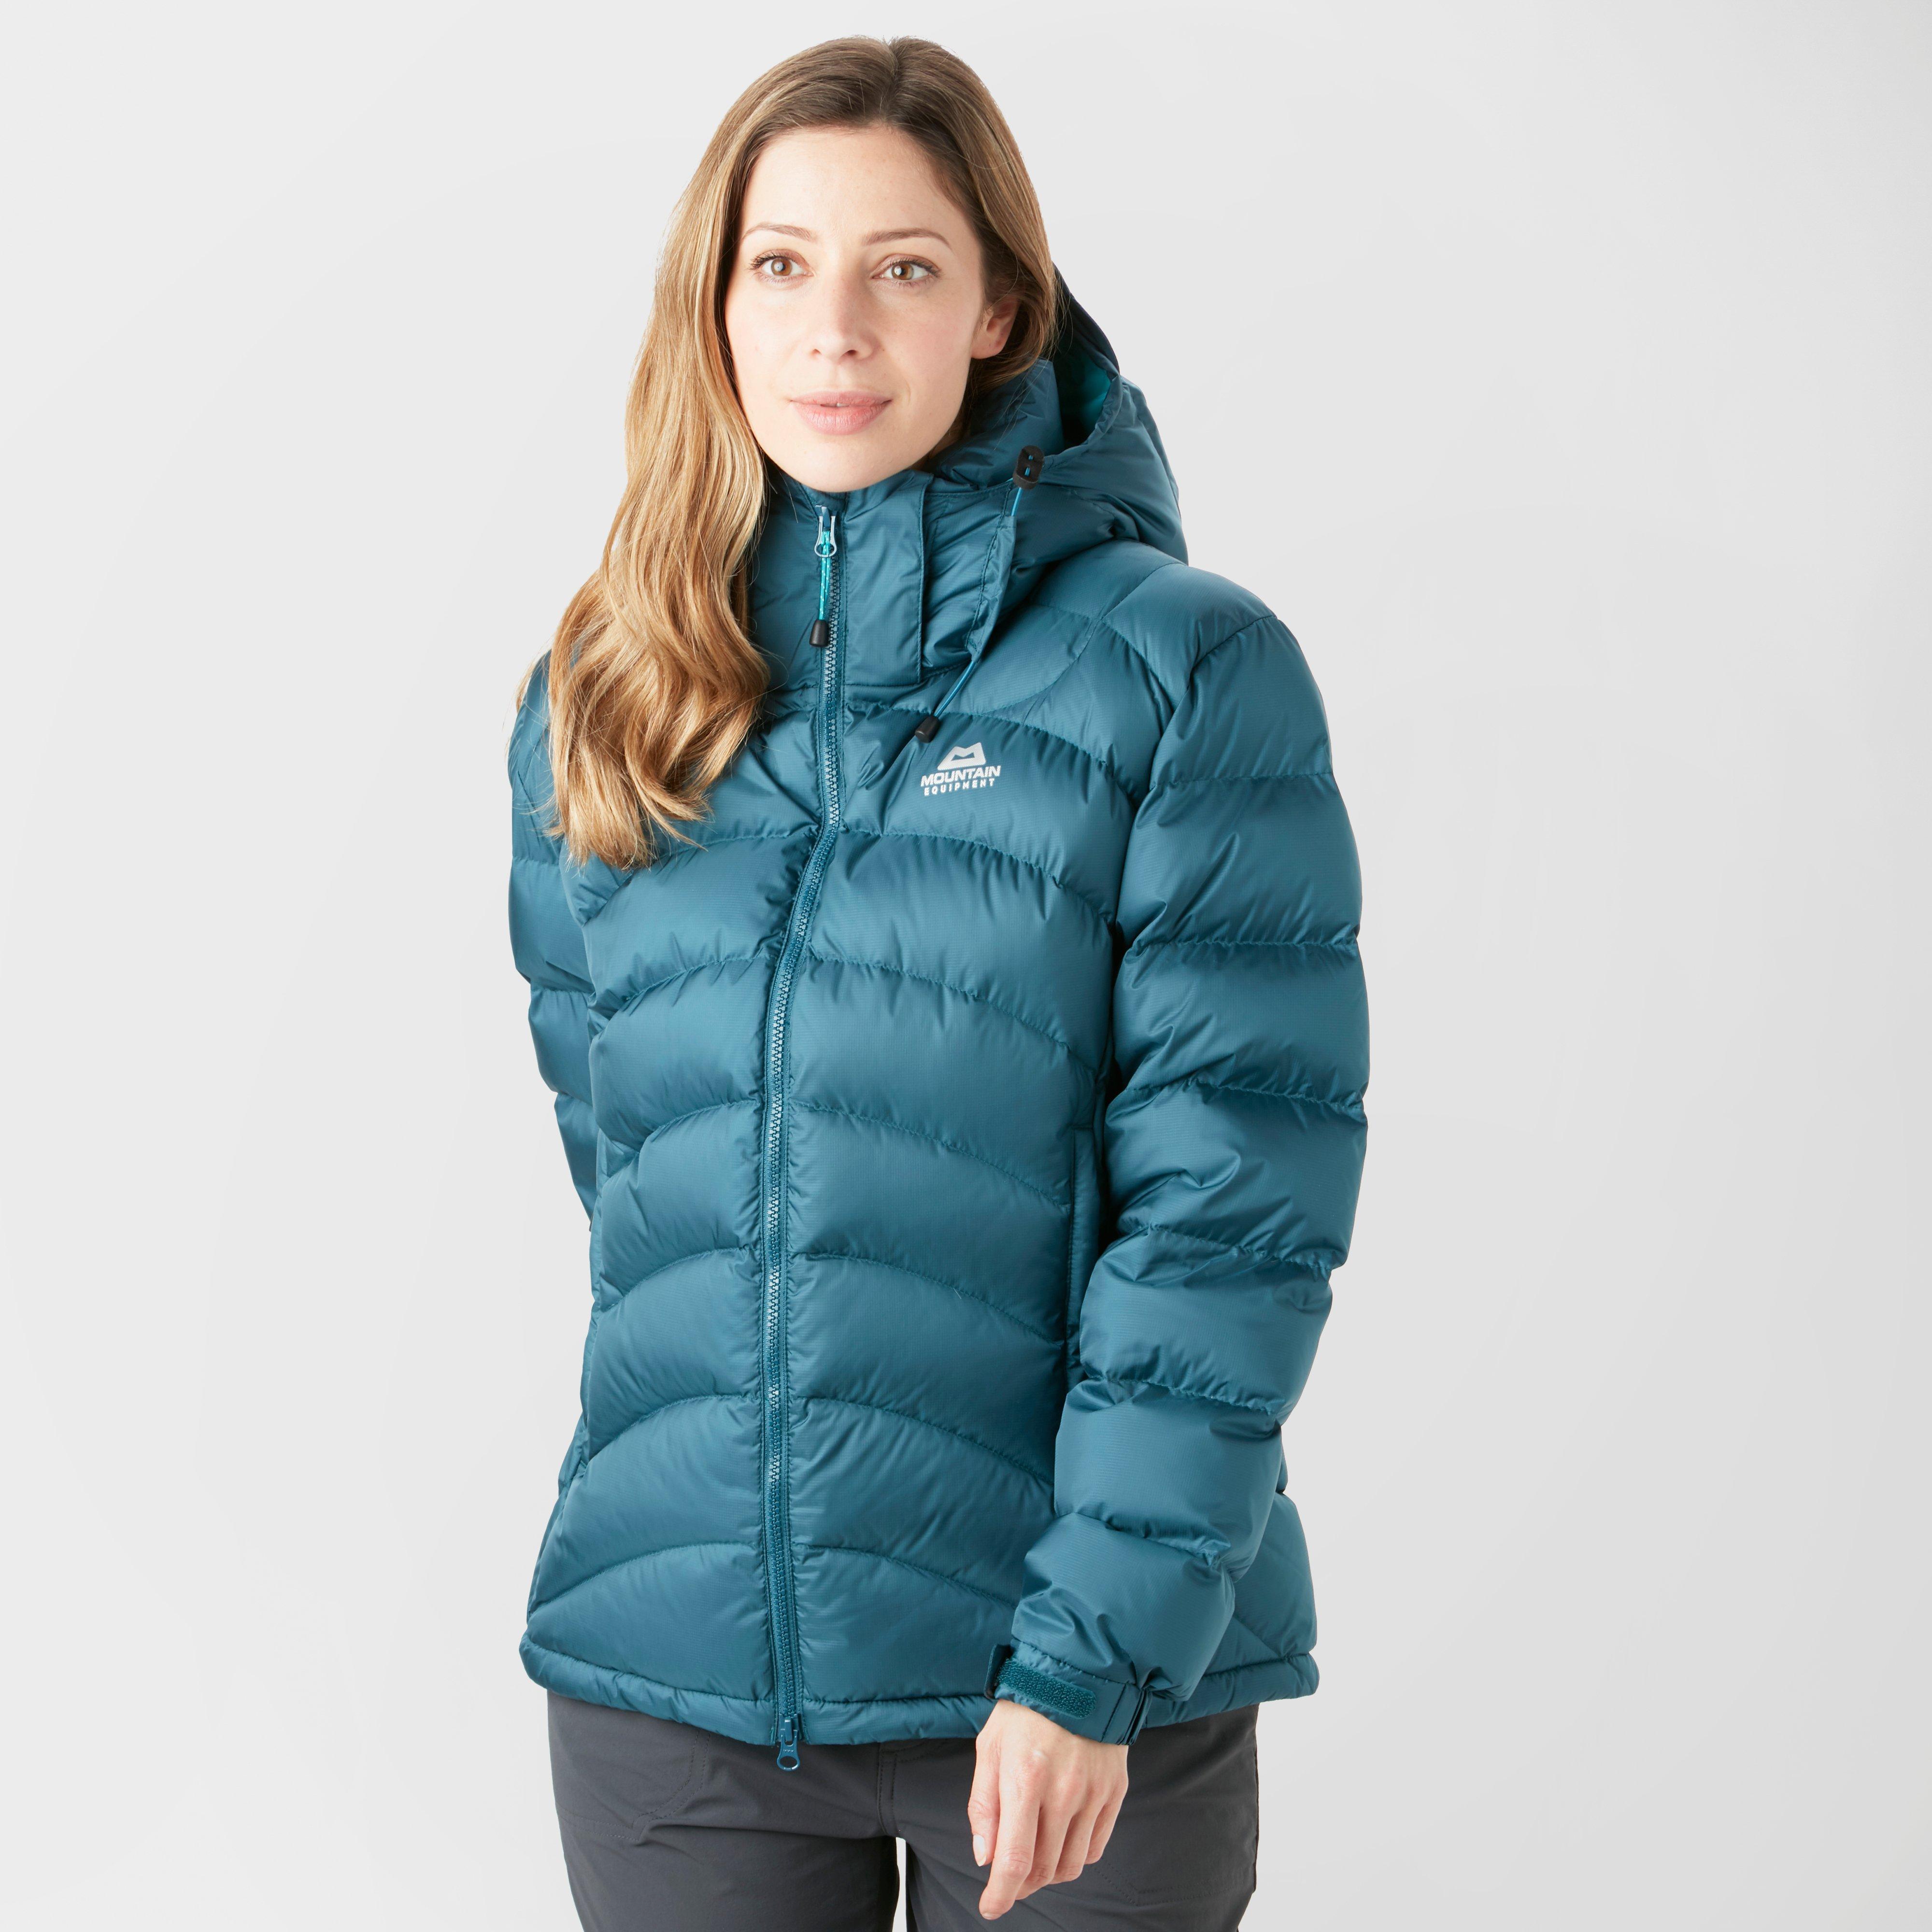 Mountain Equipment Mountain Equipment Womens Lightline Down Jacket - Blue, Blue